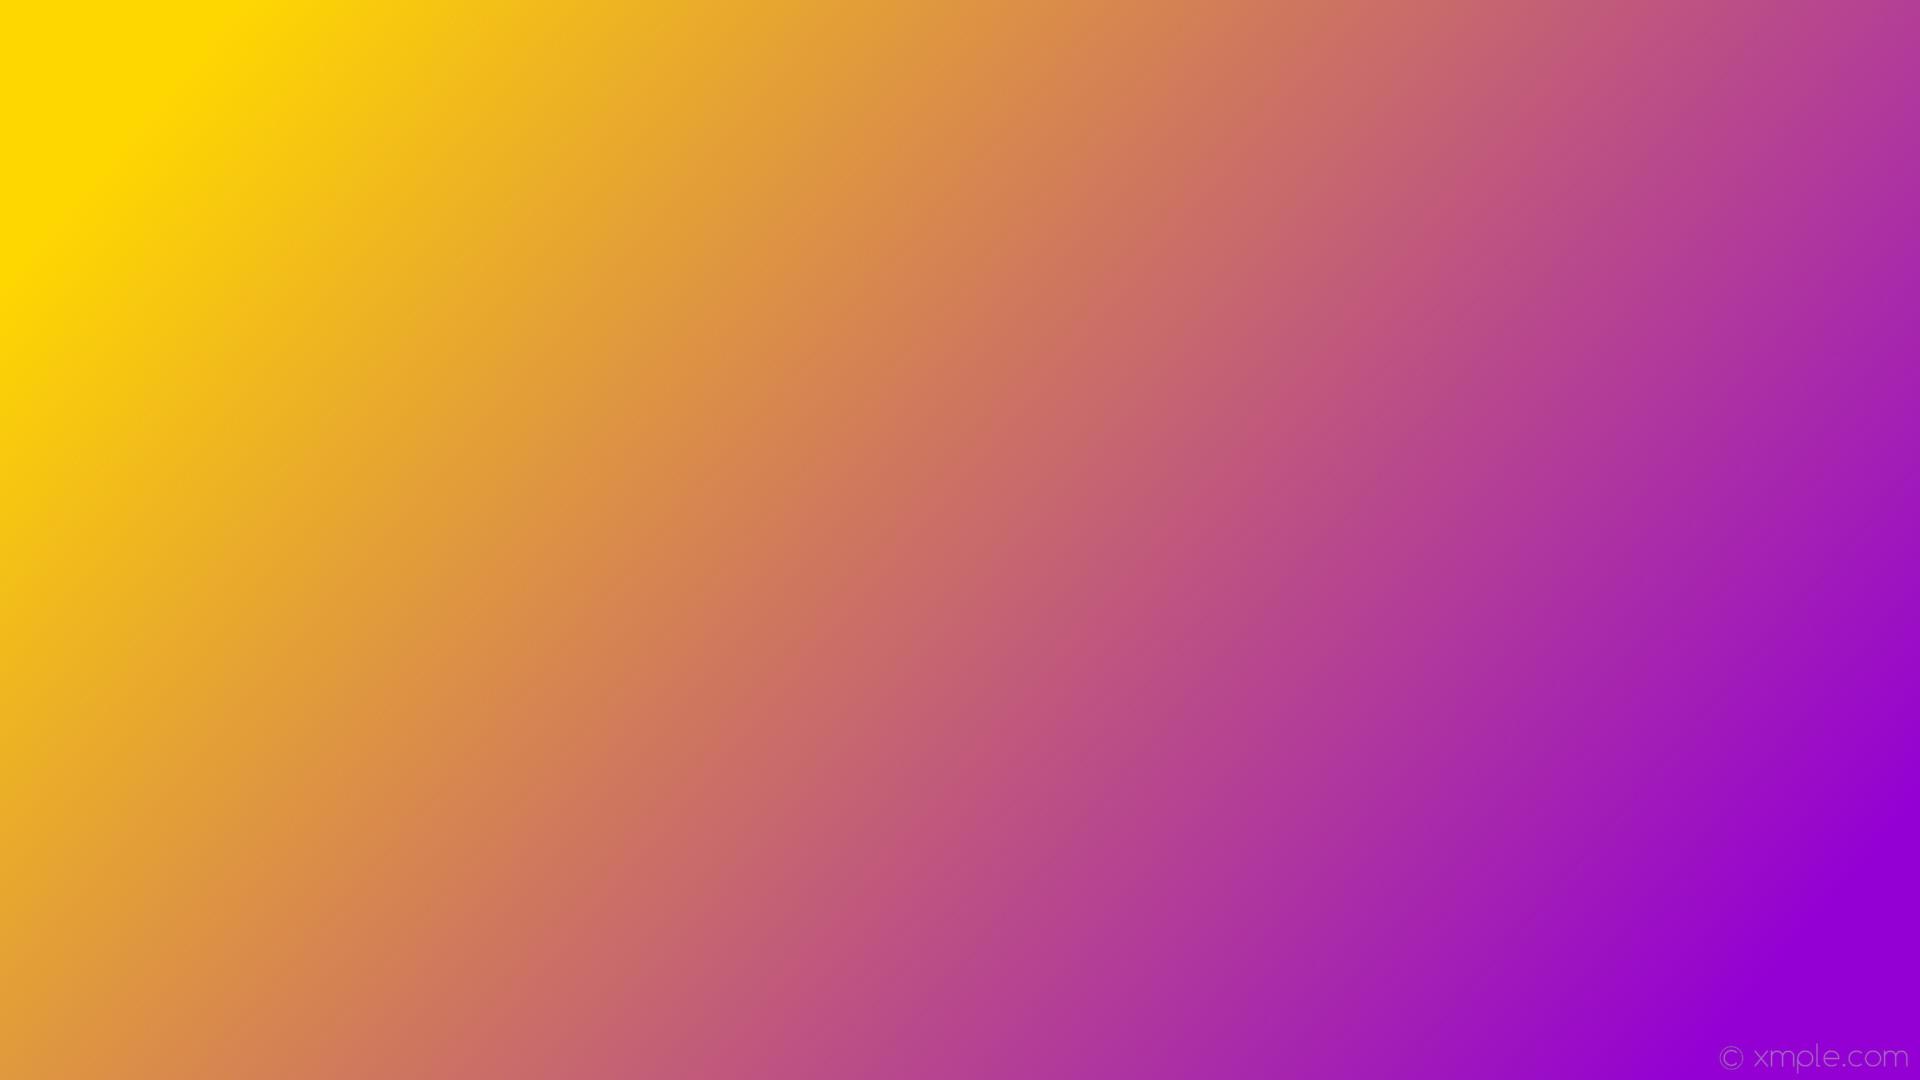 wallpaper yellow gradient linear purple gold dark violet #ffd700 #9400d3  165°